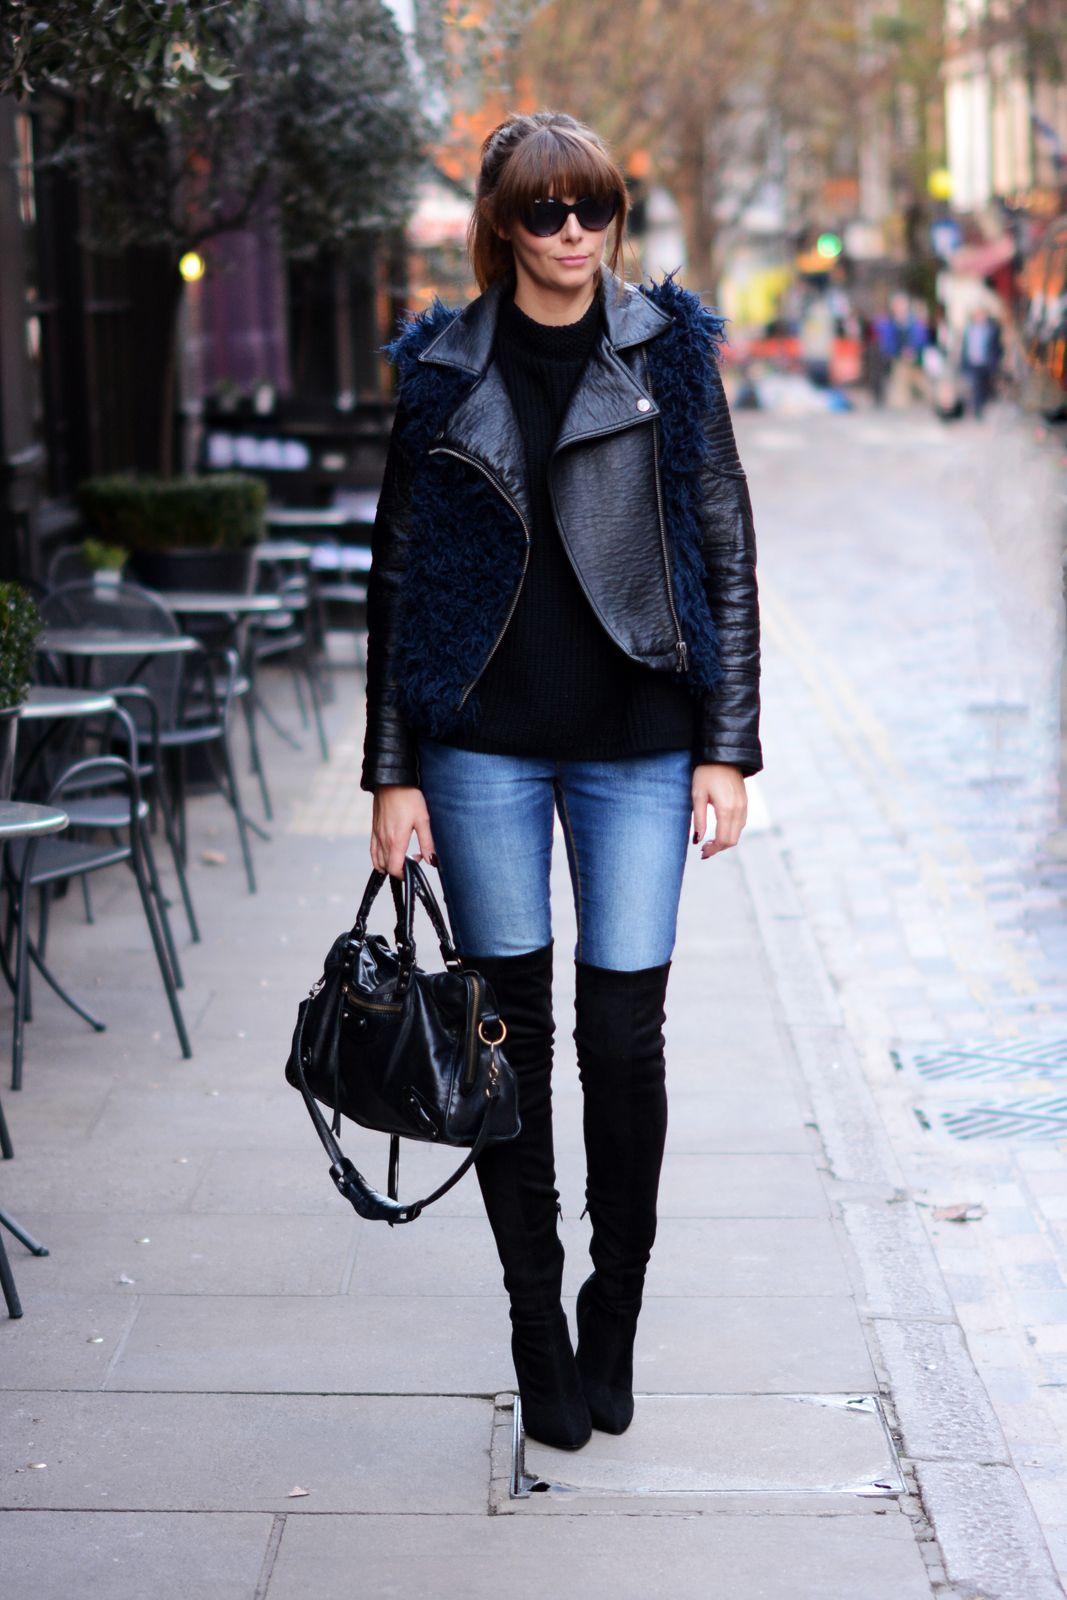 Navy and black biker jacket, skinny jeans, black OTK thigh high ...